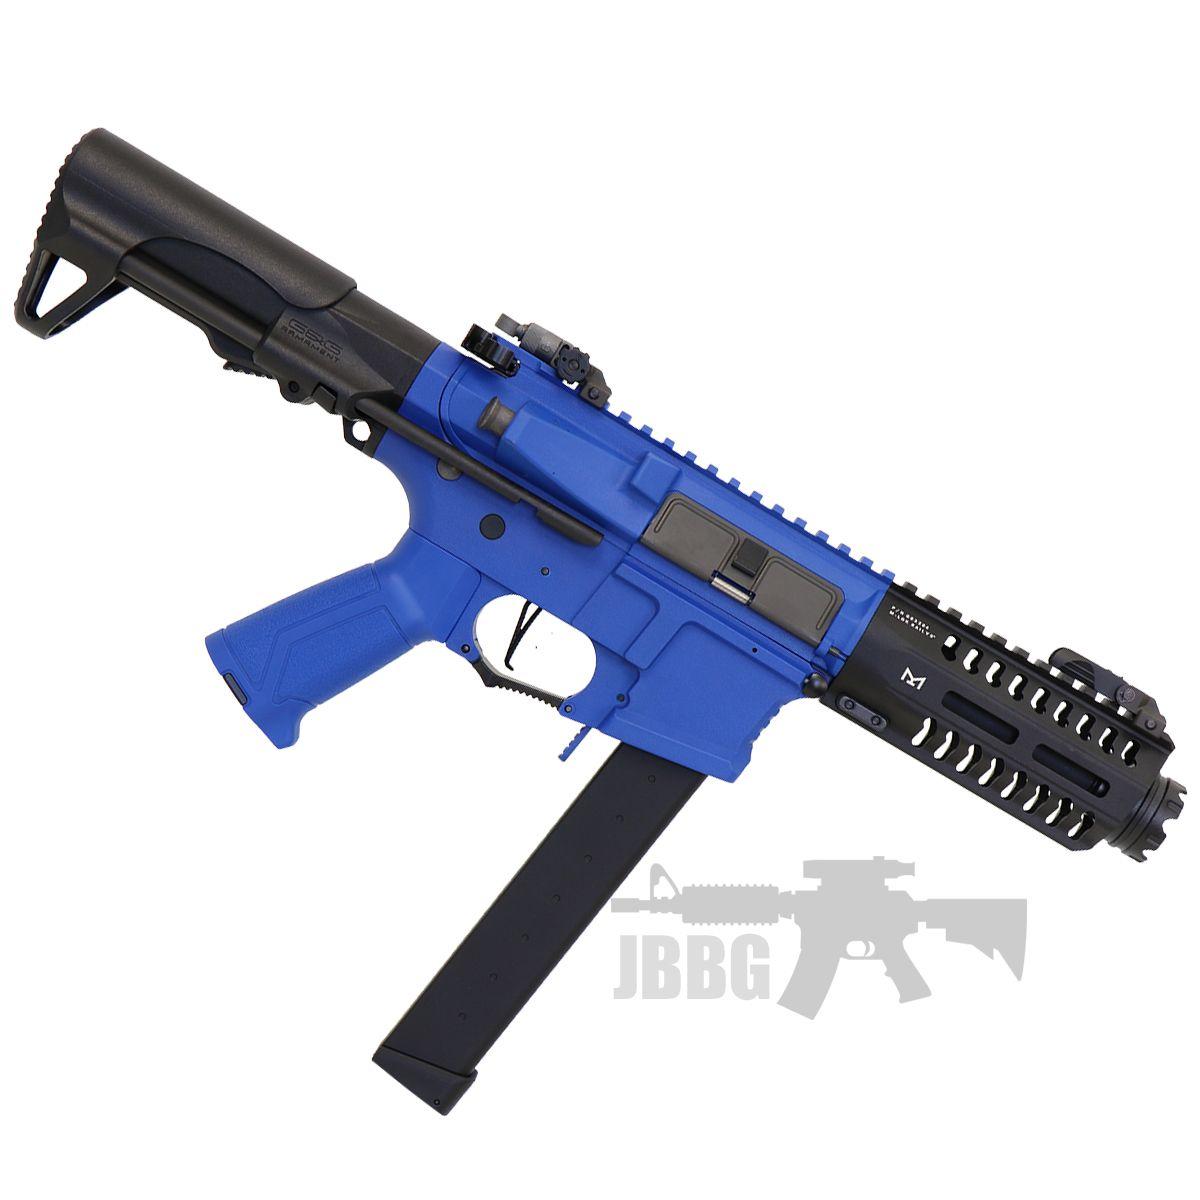 G&G Armament Combat Machine ARP-9 Airsoft Gun